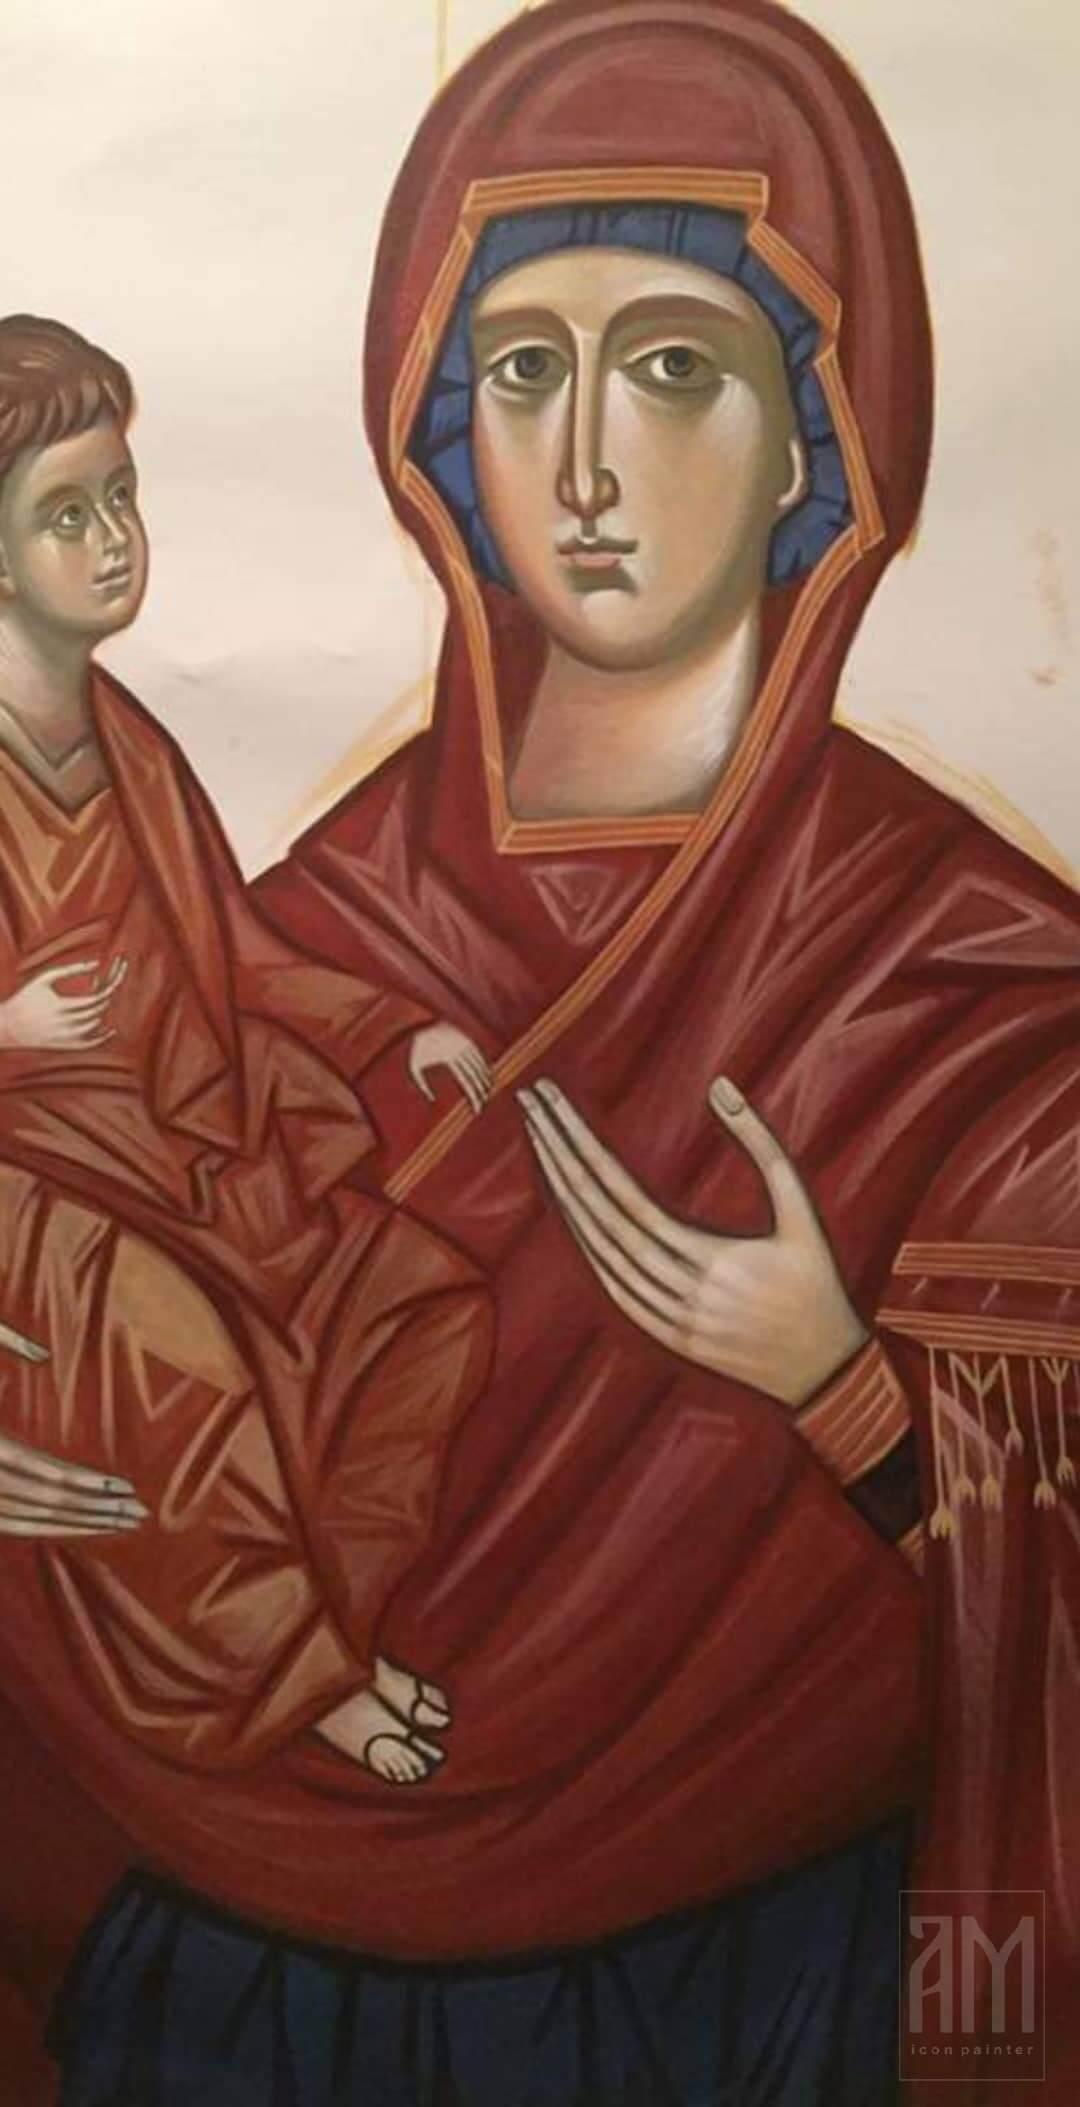 Ana Maljevic - Ikone sa blagoslovom Crkve - Radovi - Freske 07